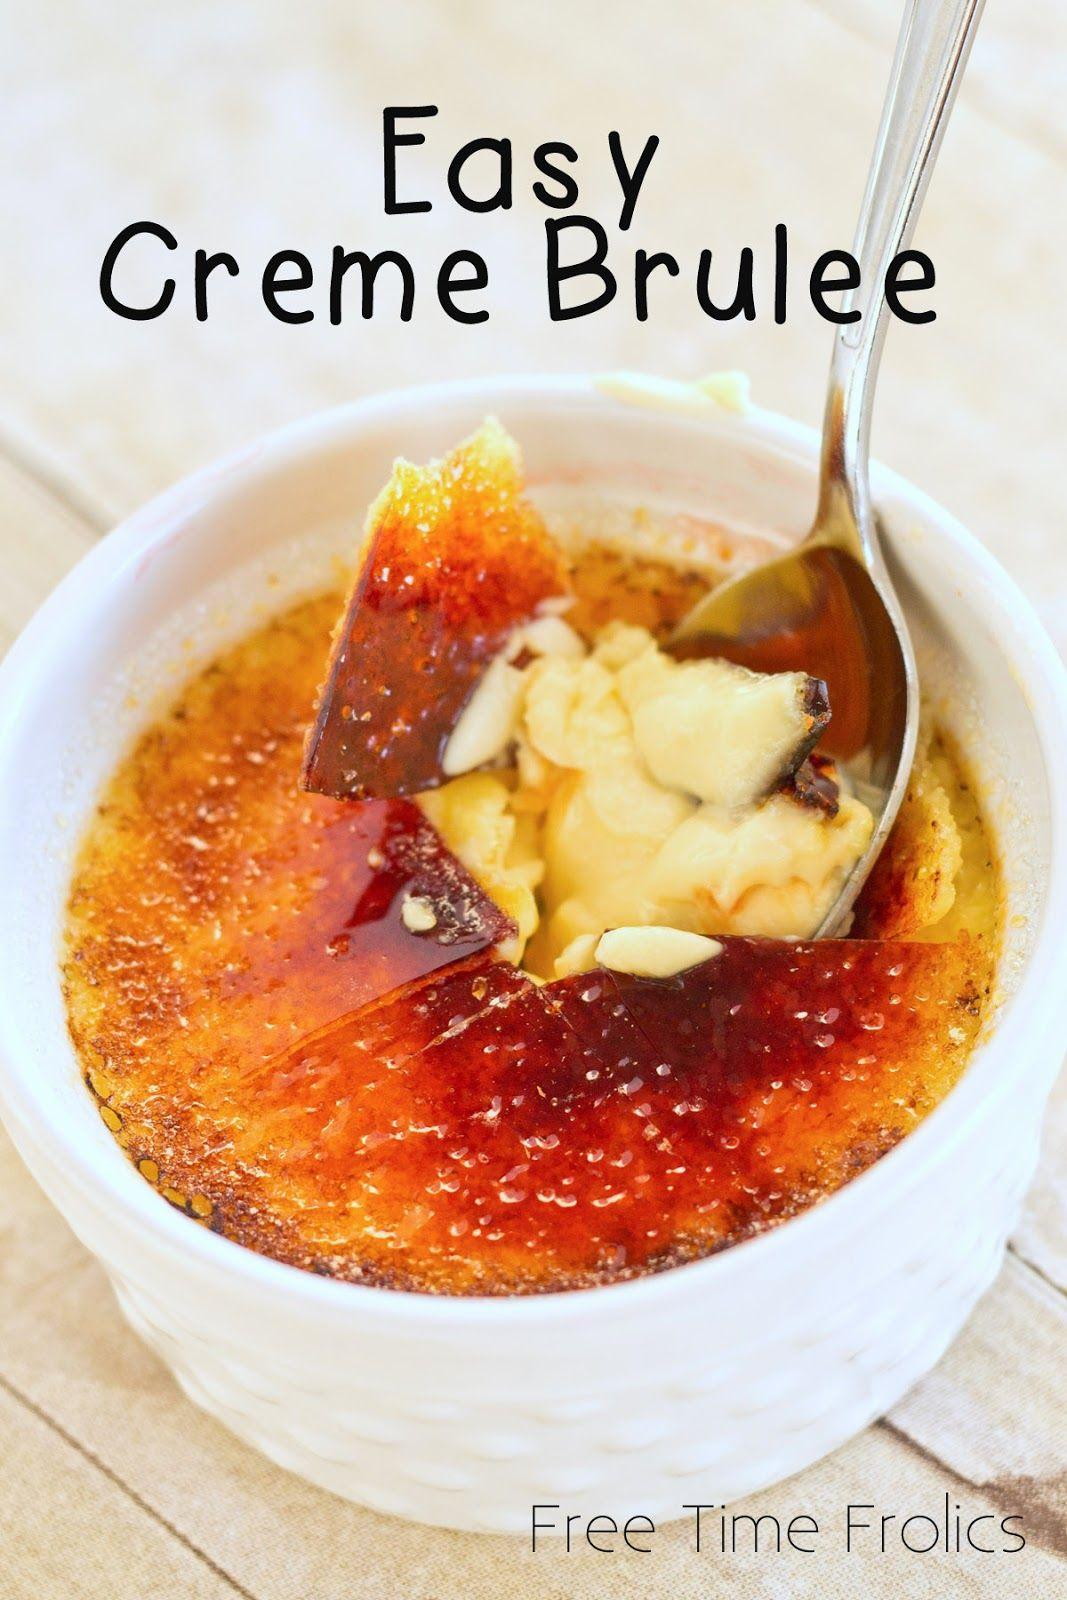 Easy Creme Brulee Recipe #cremebrulée